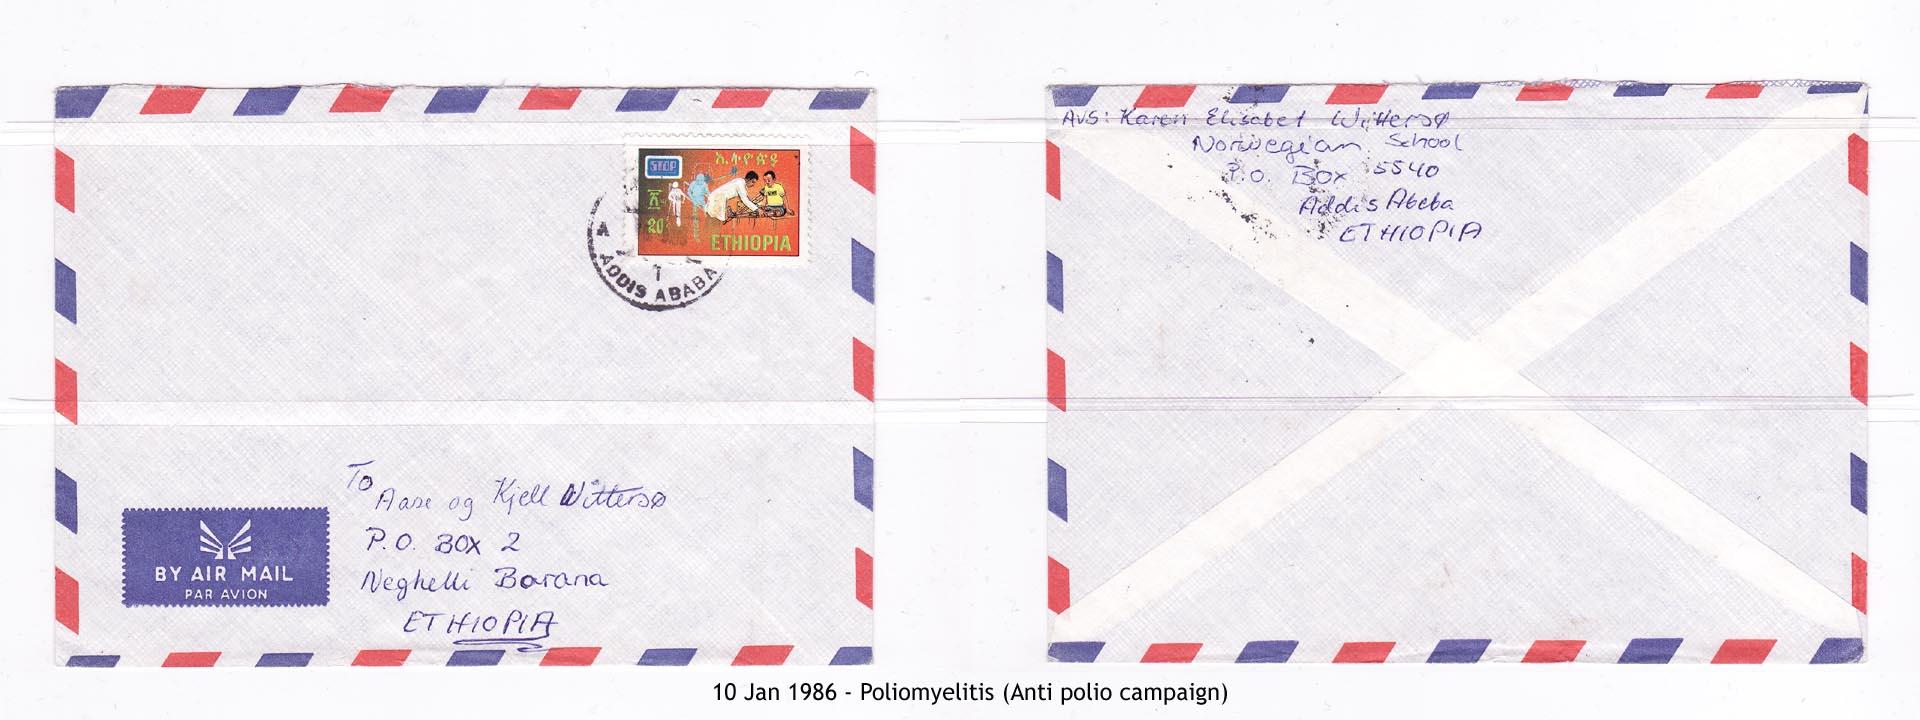 19860110 - Poliomyelitis (Anti polio campaign)